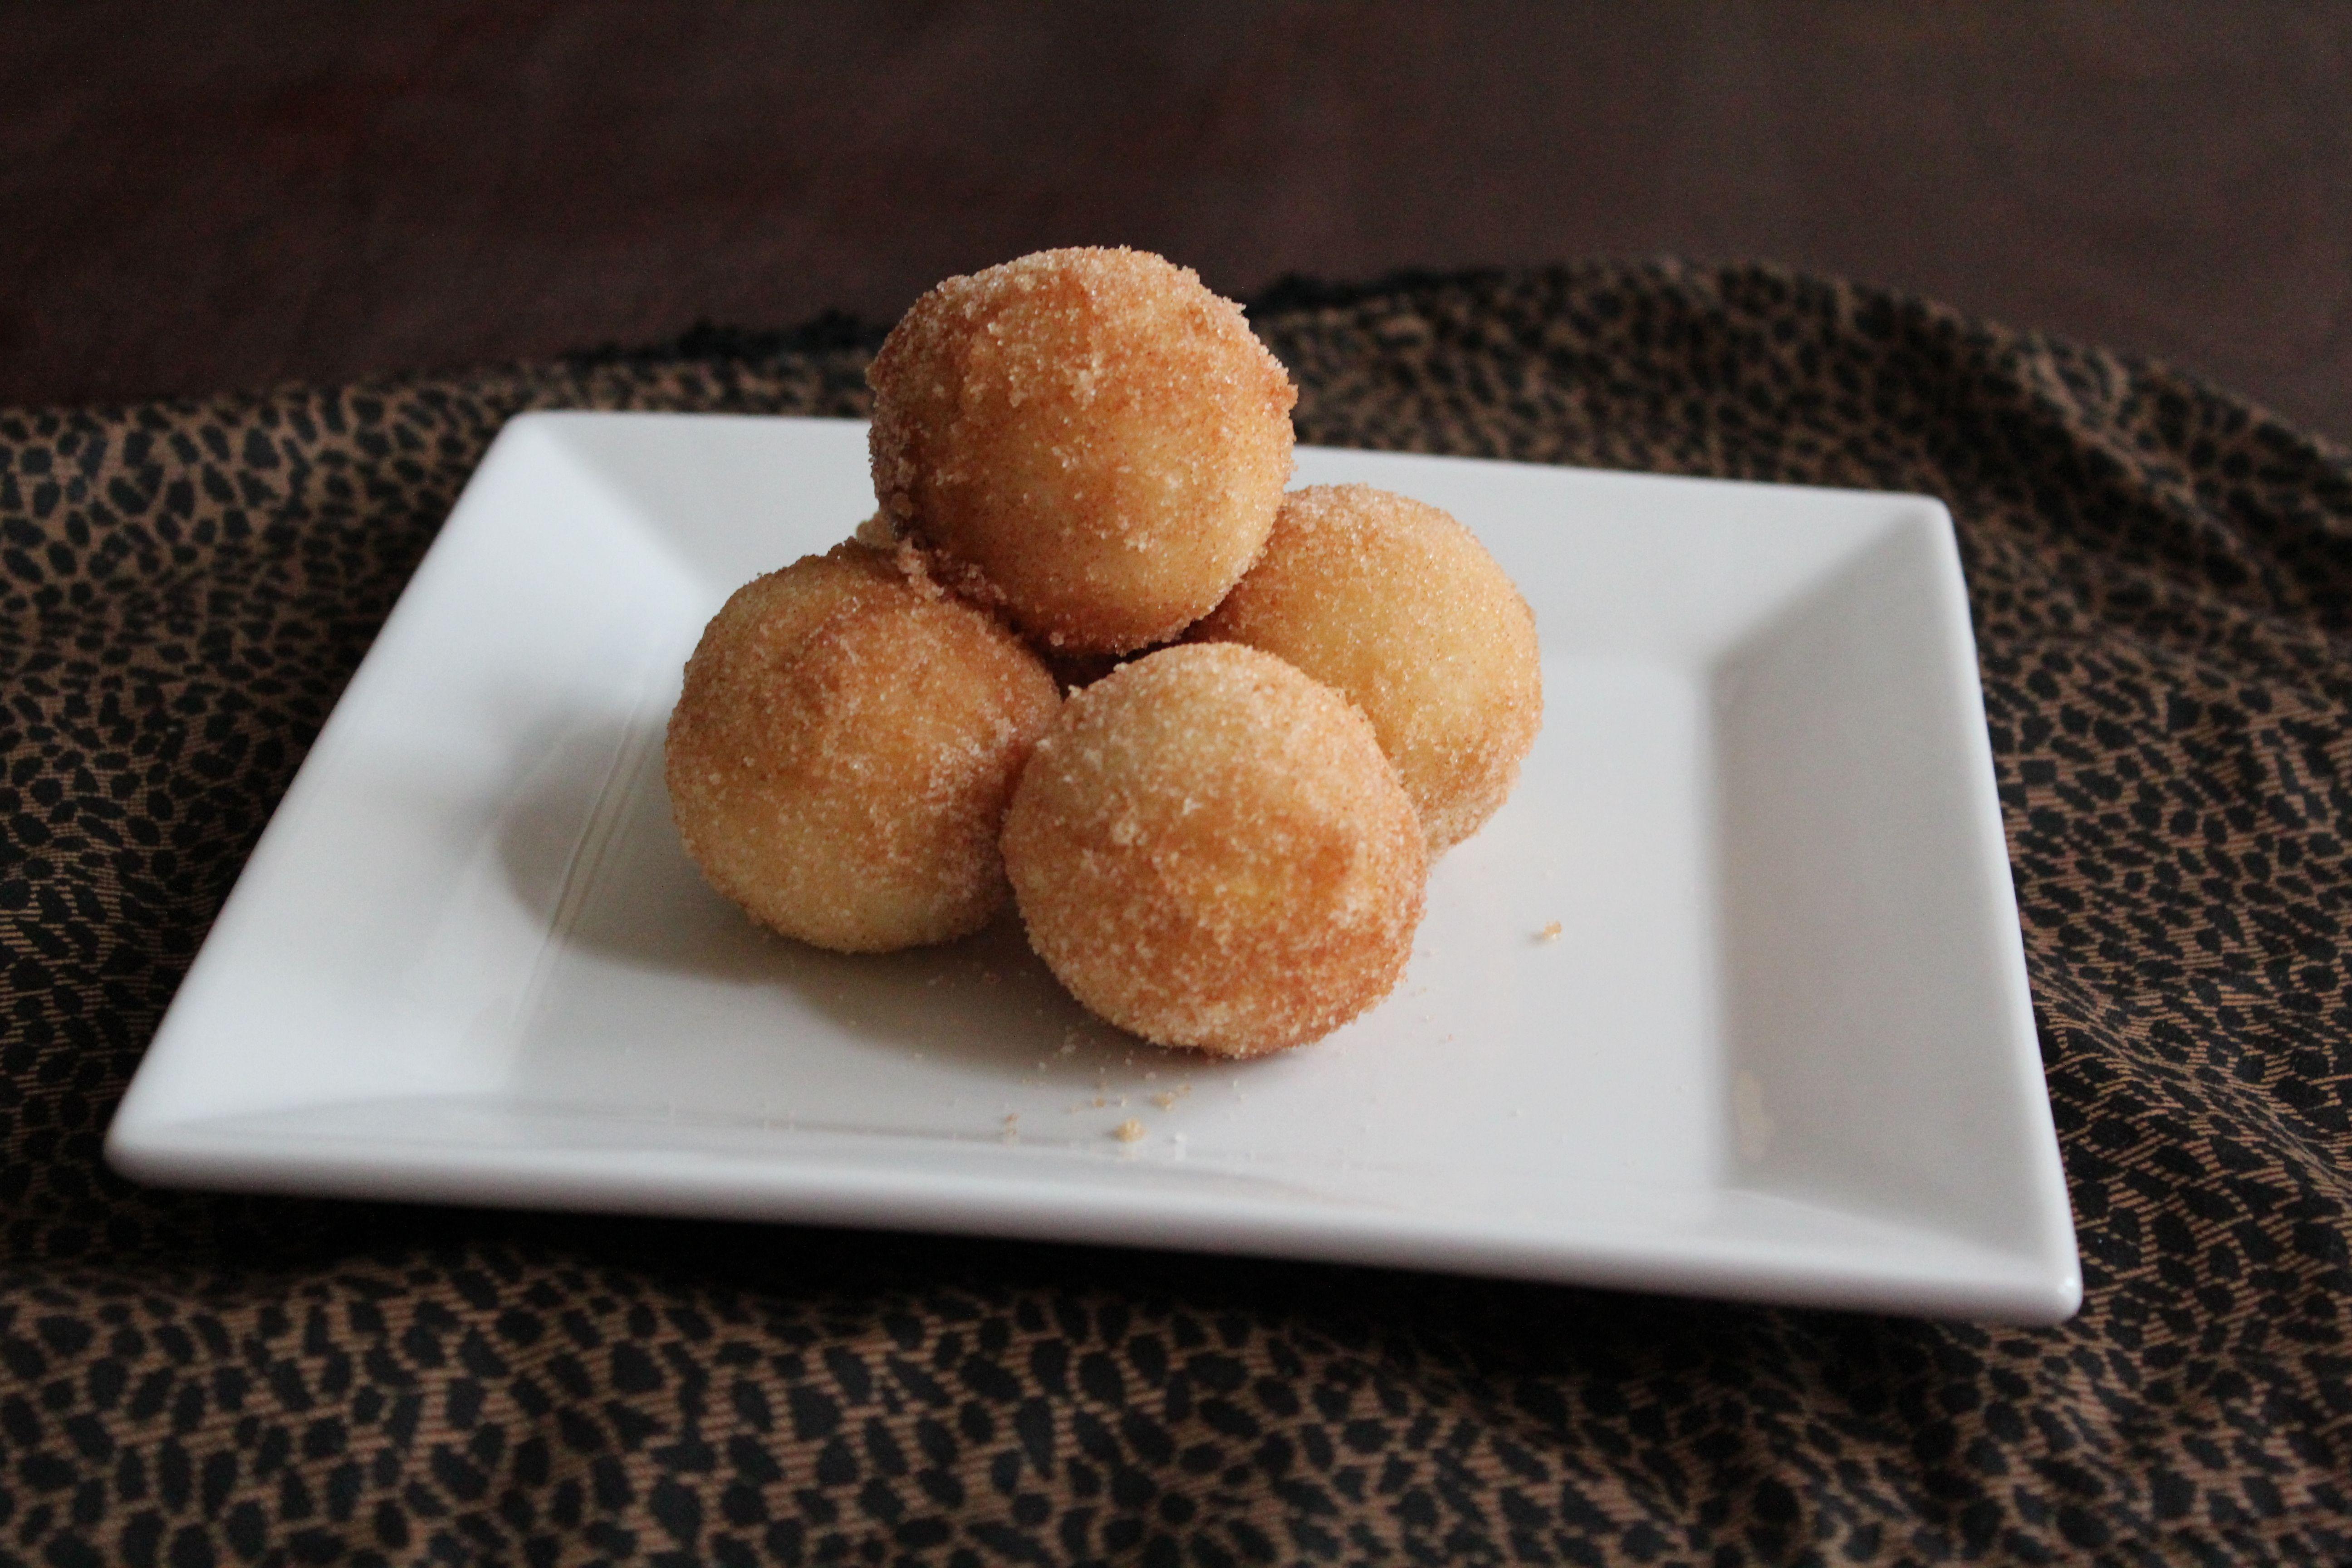 Baked cinnamon sugar donut holes